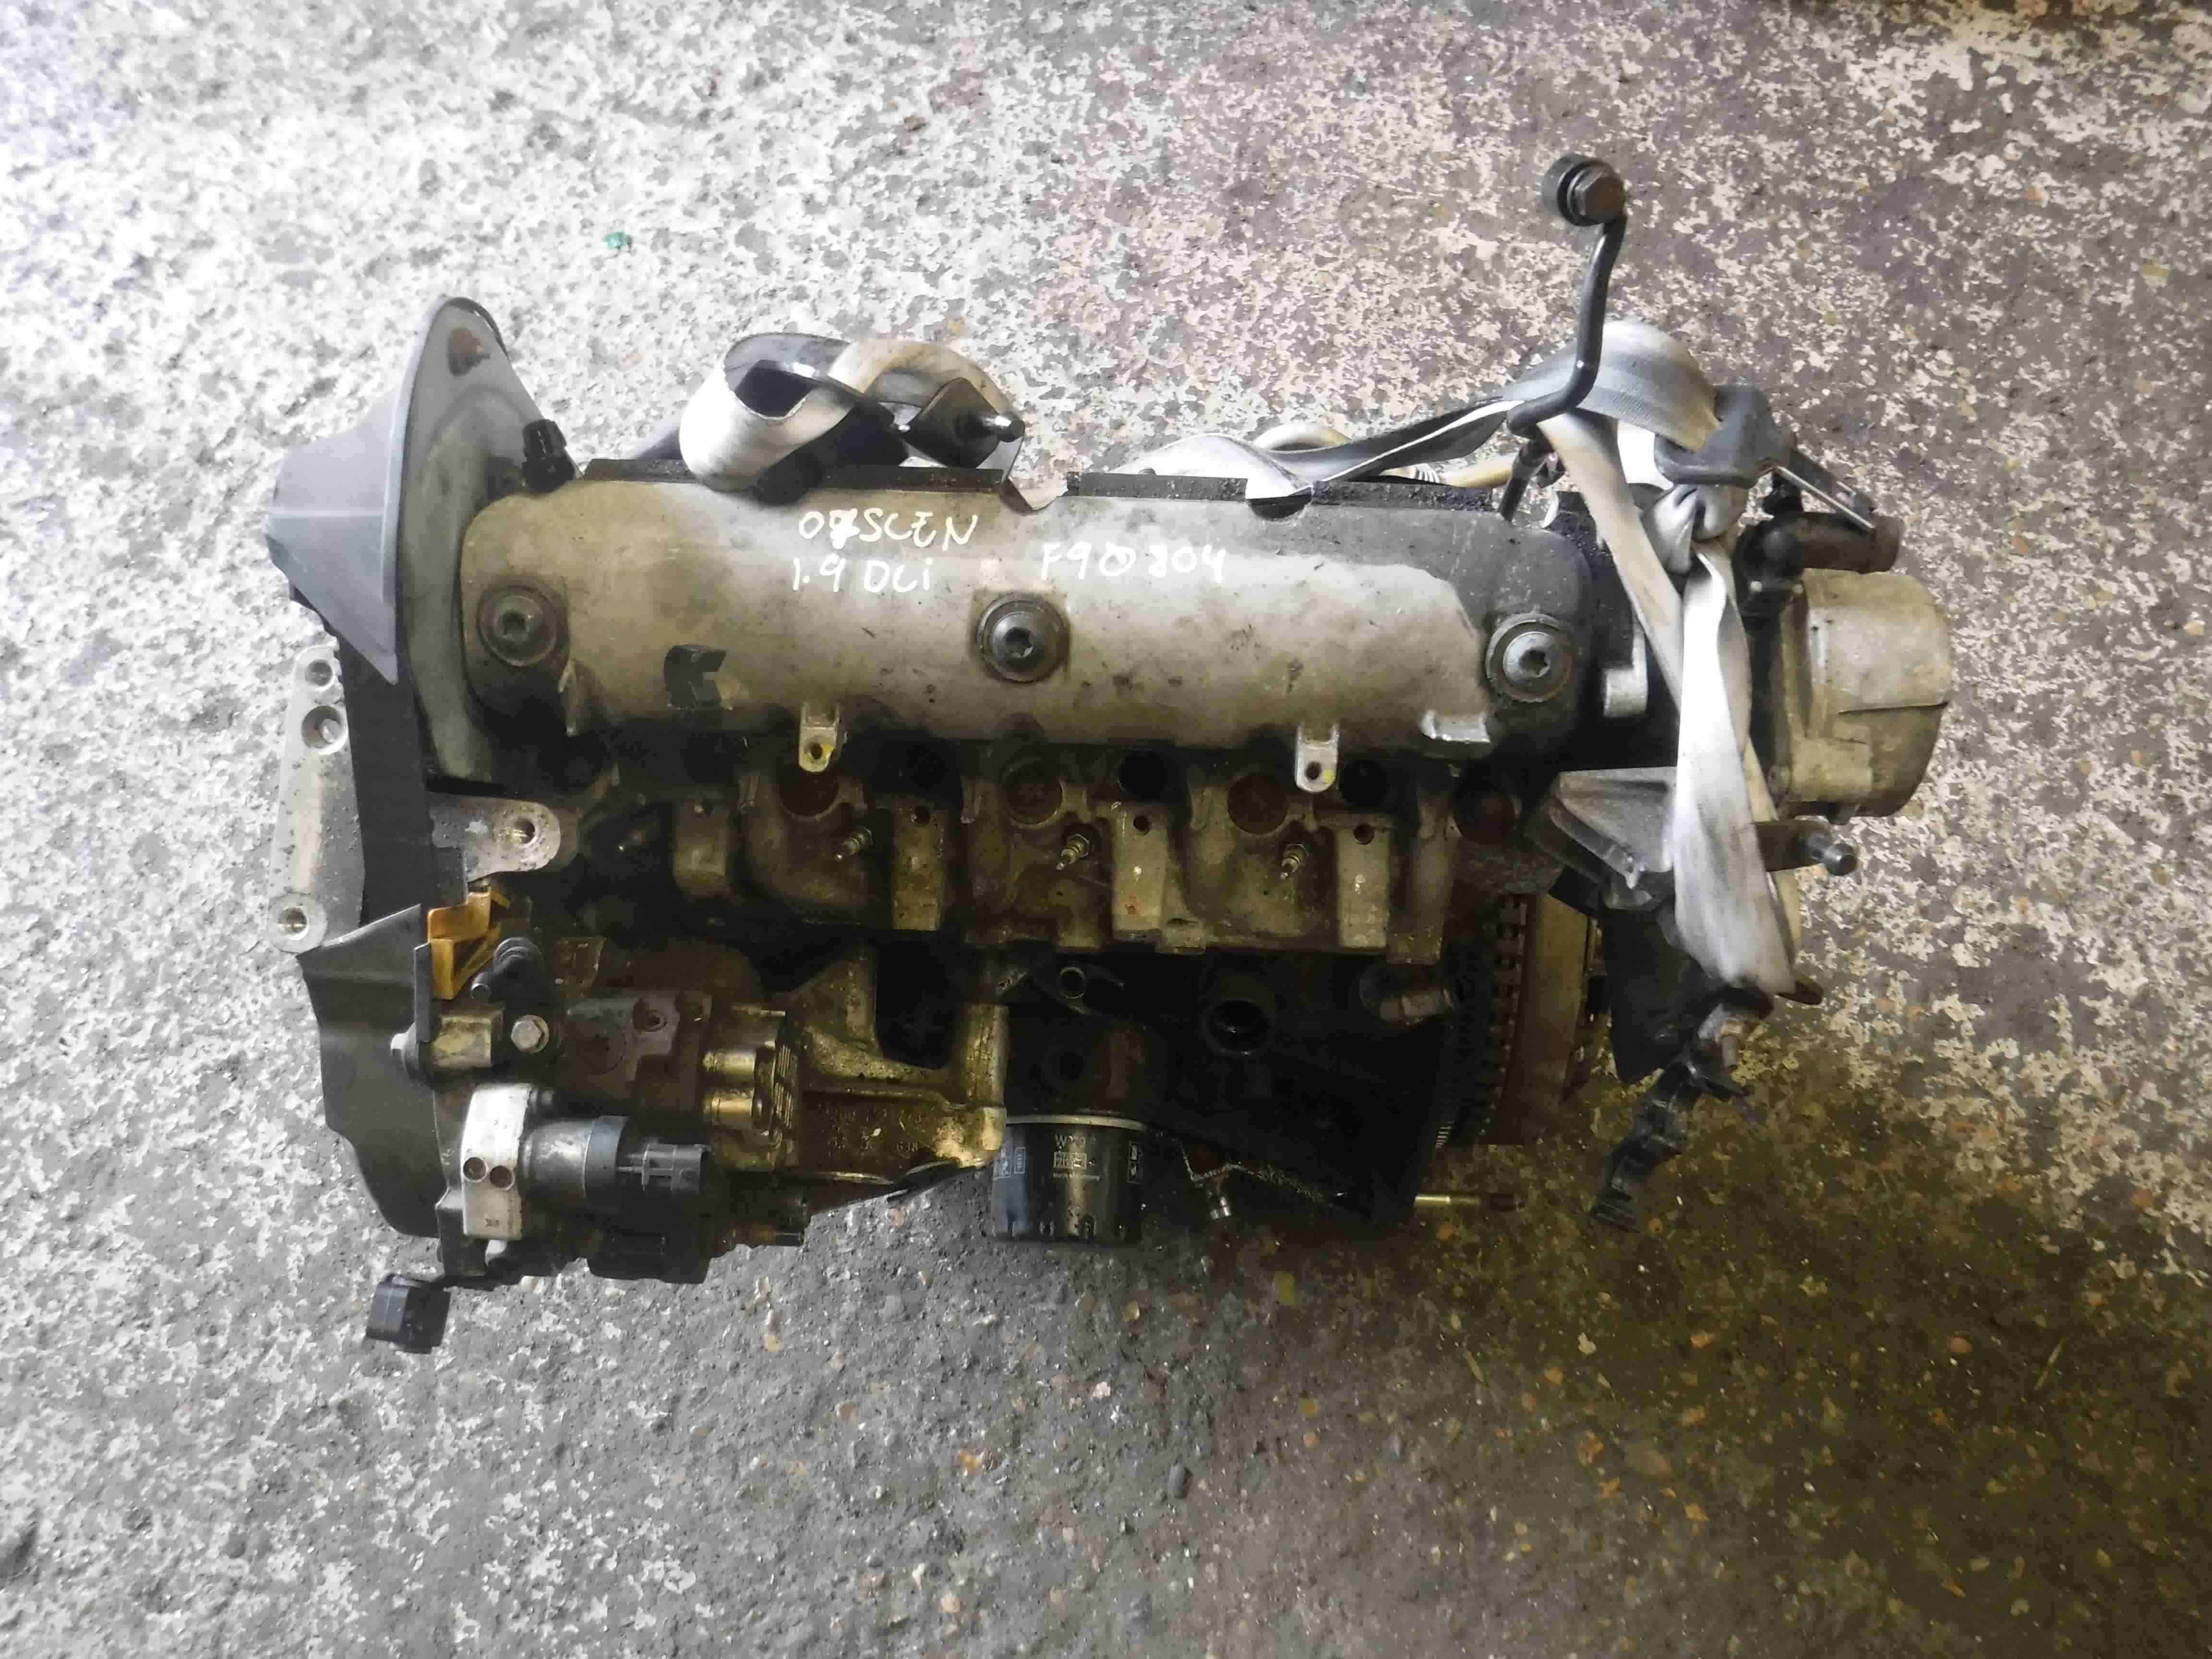 Renault Megane 2004-2009 1.9 dCi Engine F9Q 804 fq9804